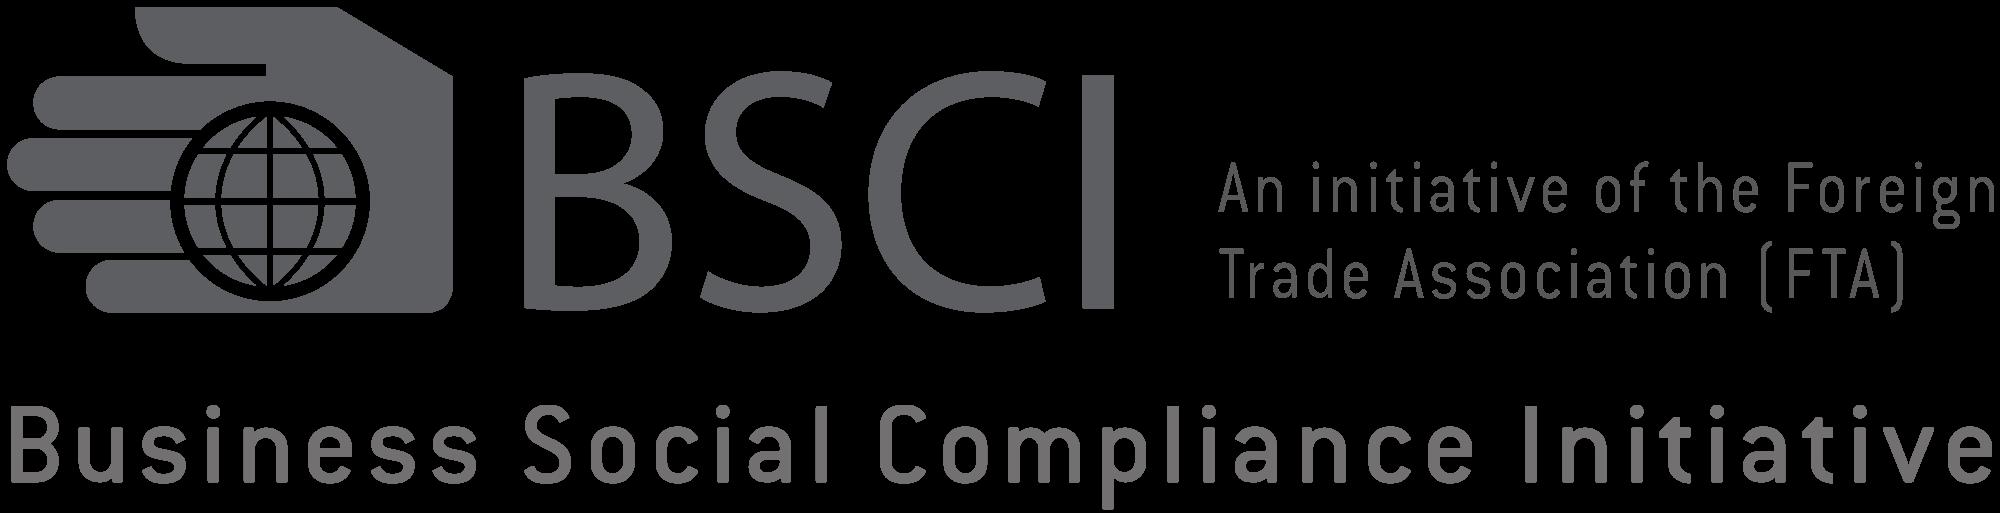 Business Social Comliance Initiative